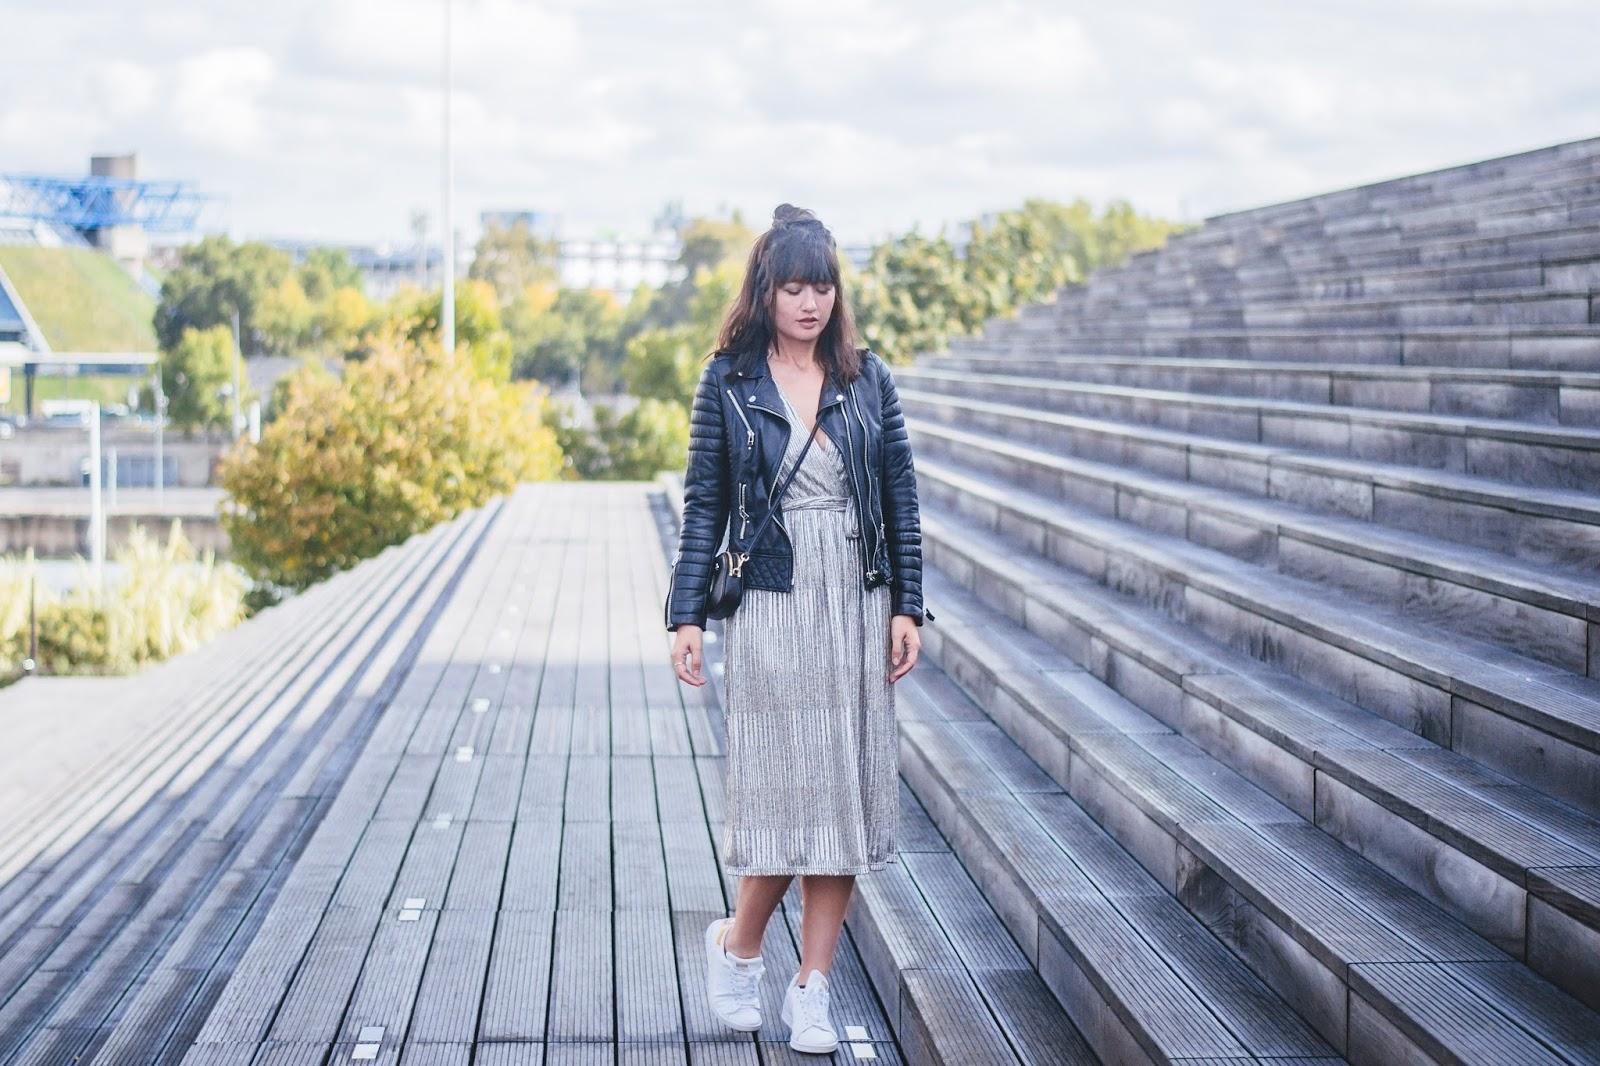 meetmeinparee-paris-style-look-mode-fashion-streetstyle-parisianchic-bloggerinparis